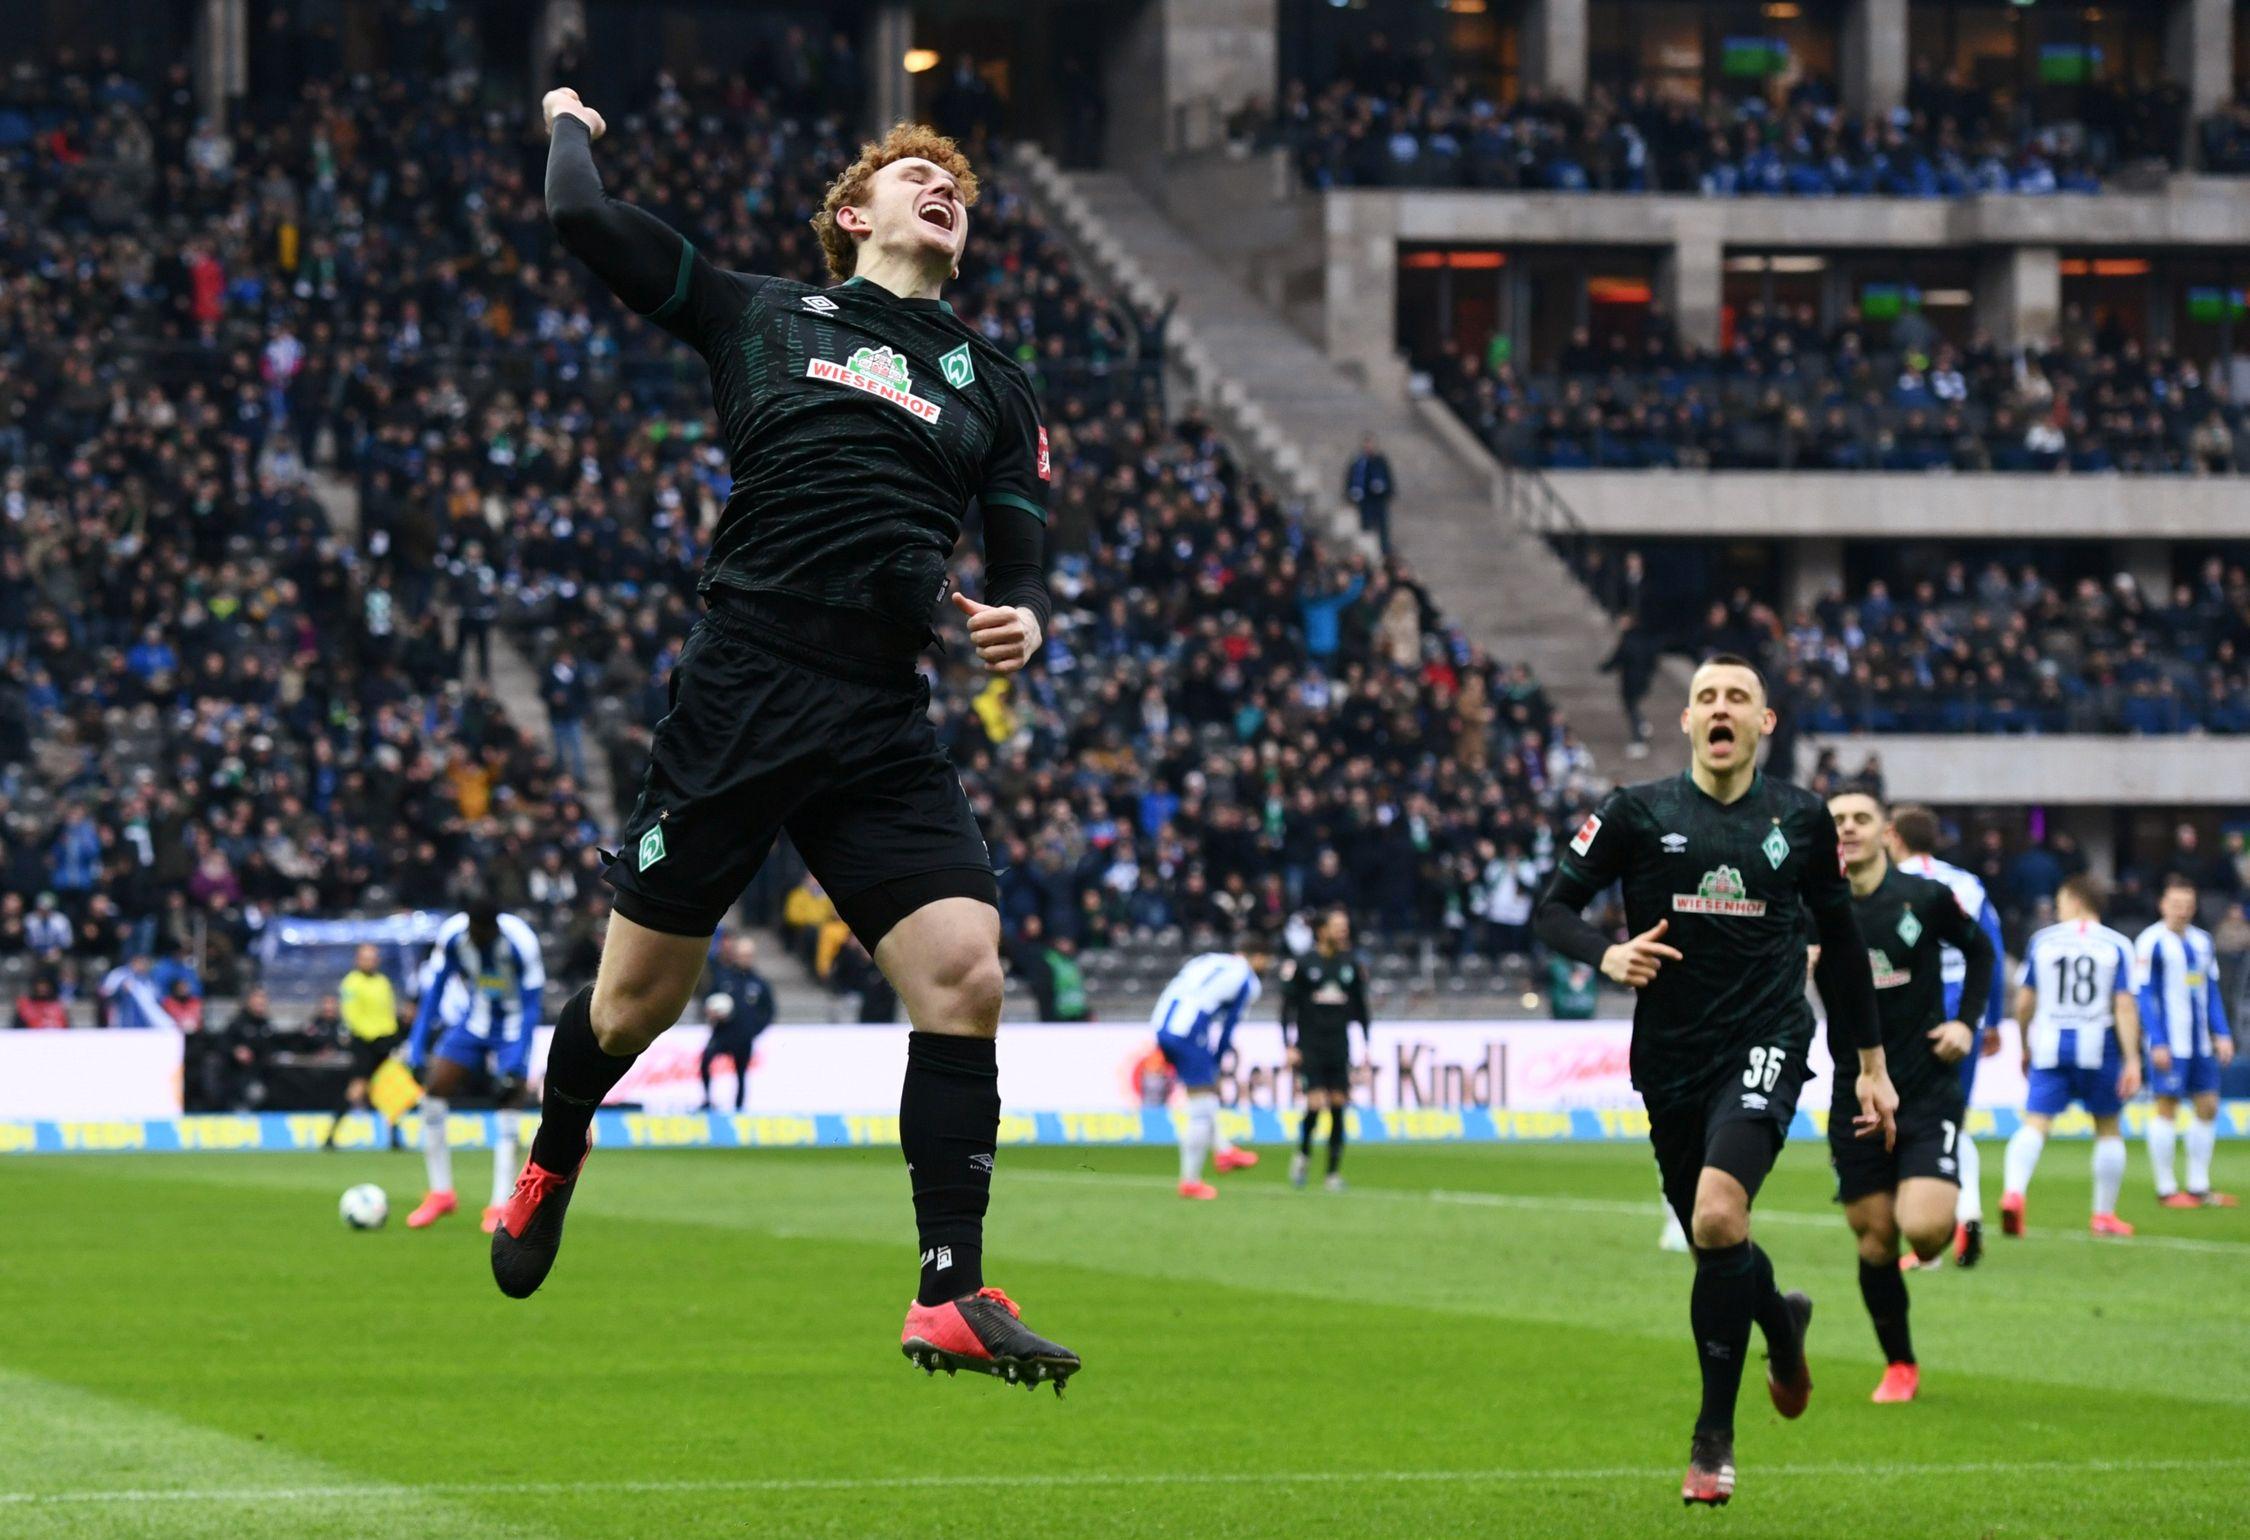 Infos sports en direct : Football - </b>Etranger - Bundesliga  : </b>Werder Brême-Bayer Leverkusen en direct